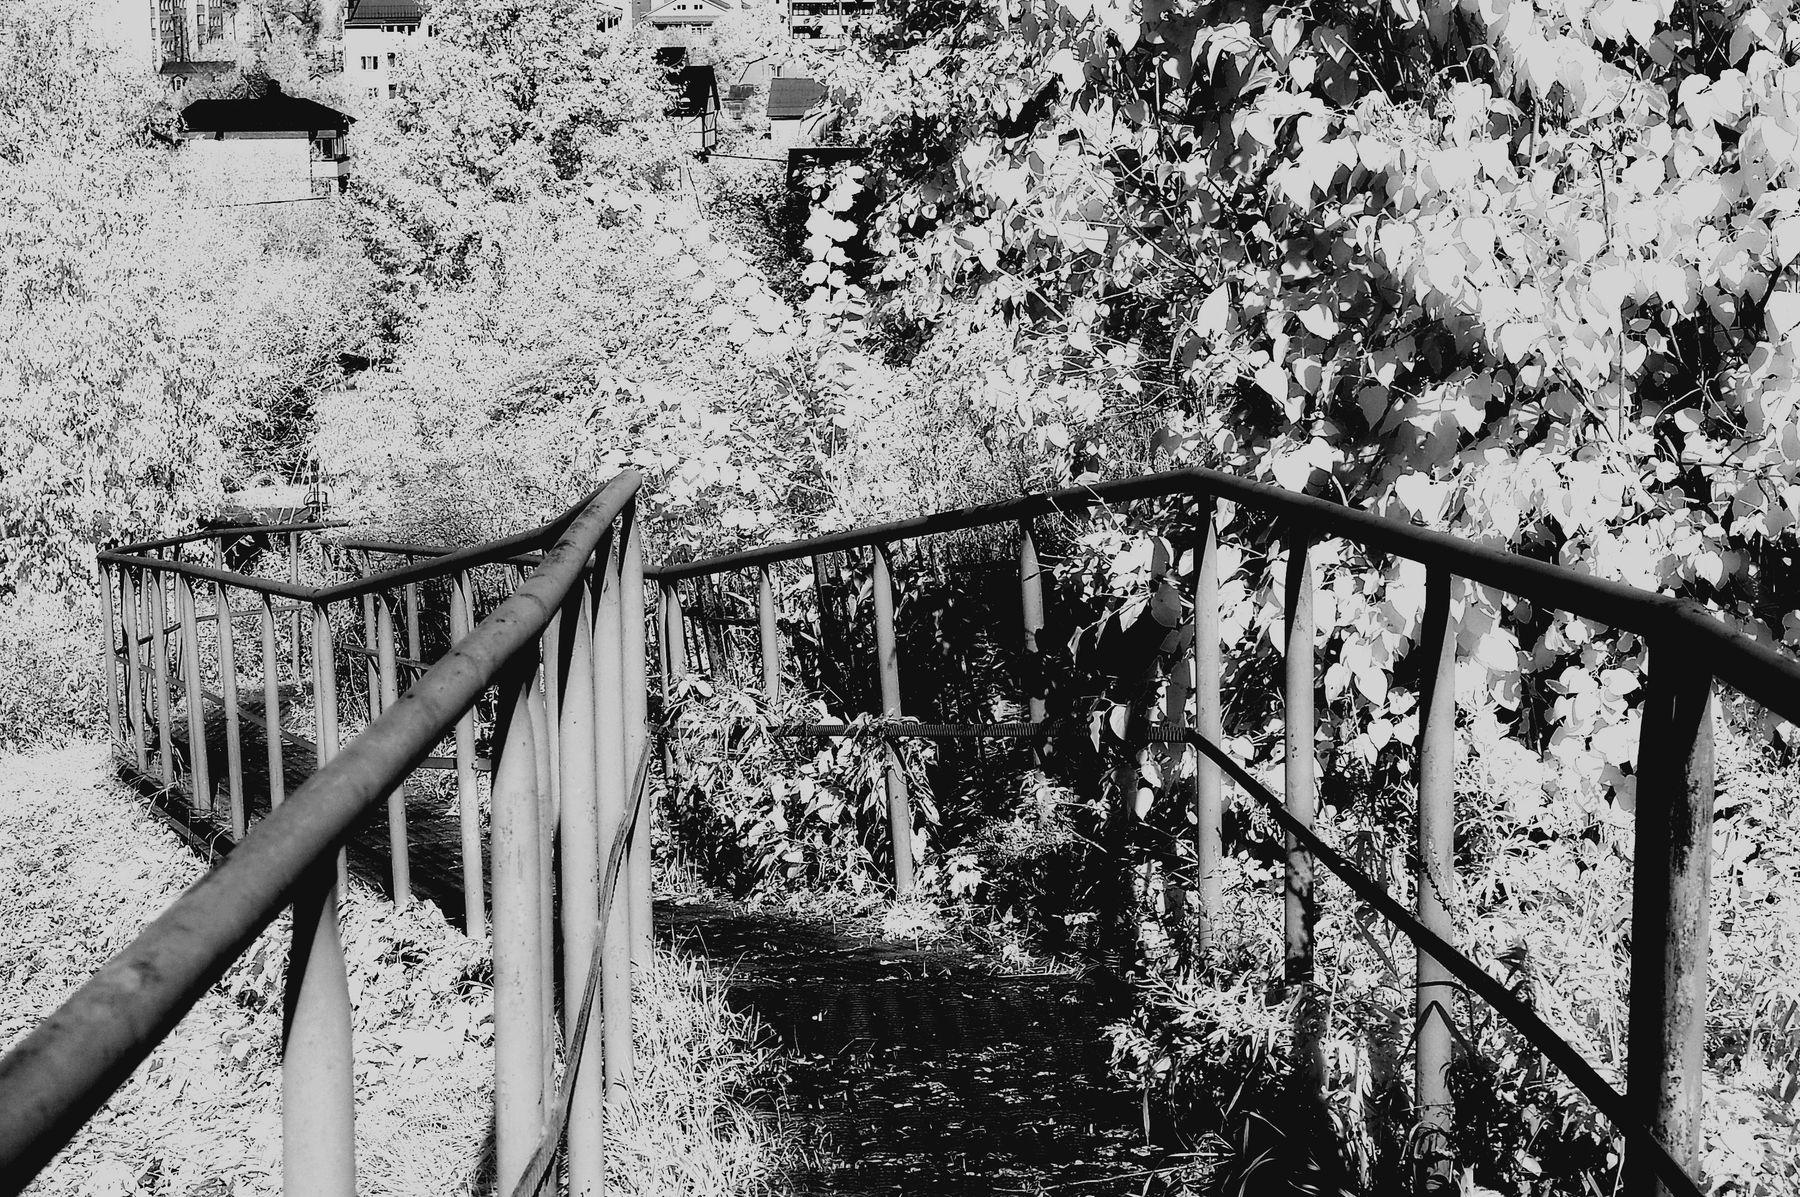 Дорога от храма с Туговой горы. Ярославль. 2020 г. от Р.Х. Монохромная инфракрасная фотография. Инфракрасная фотография